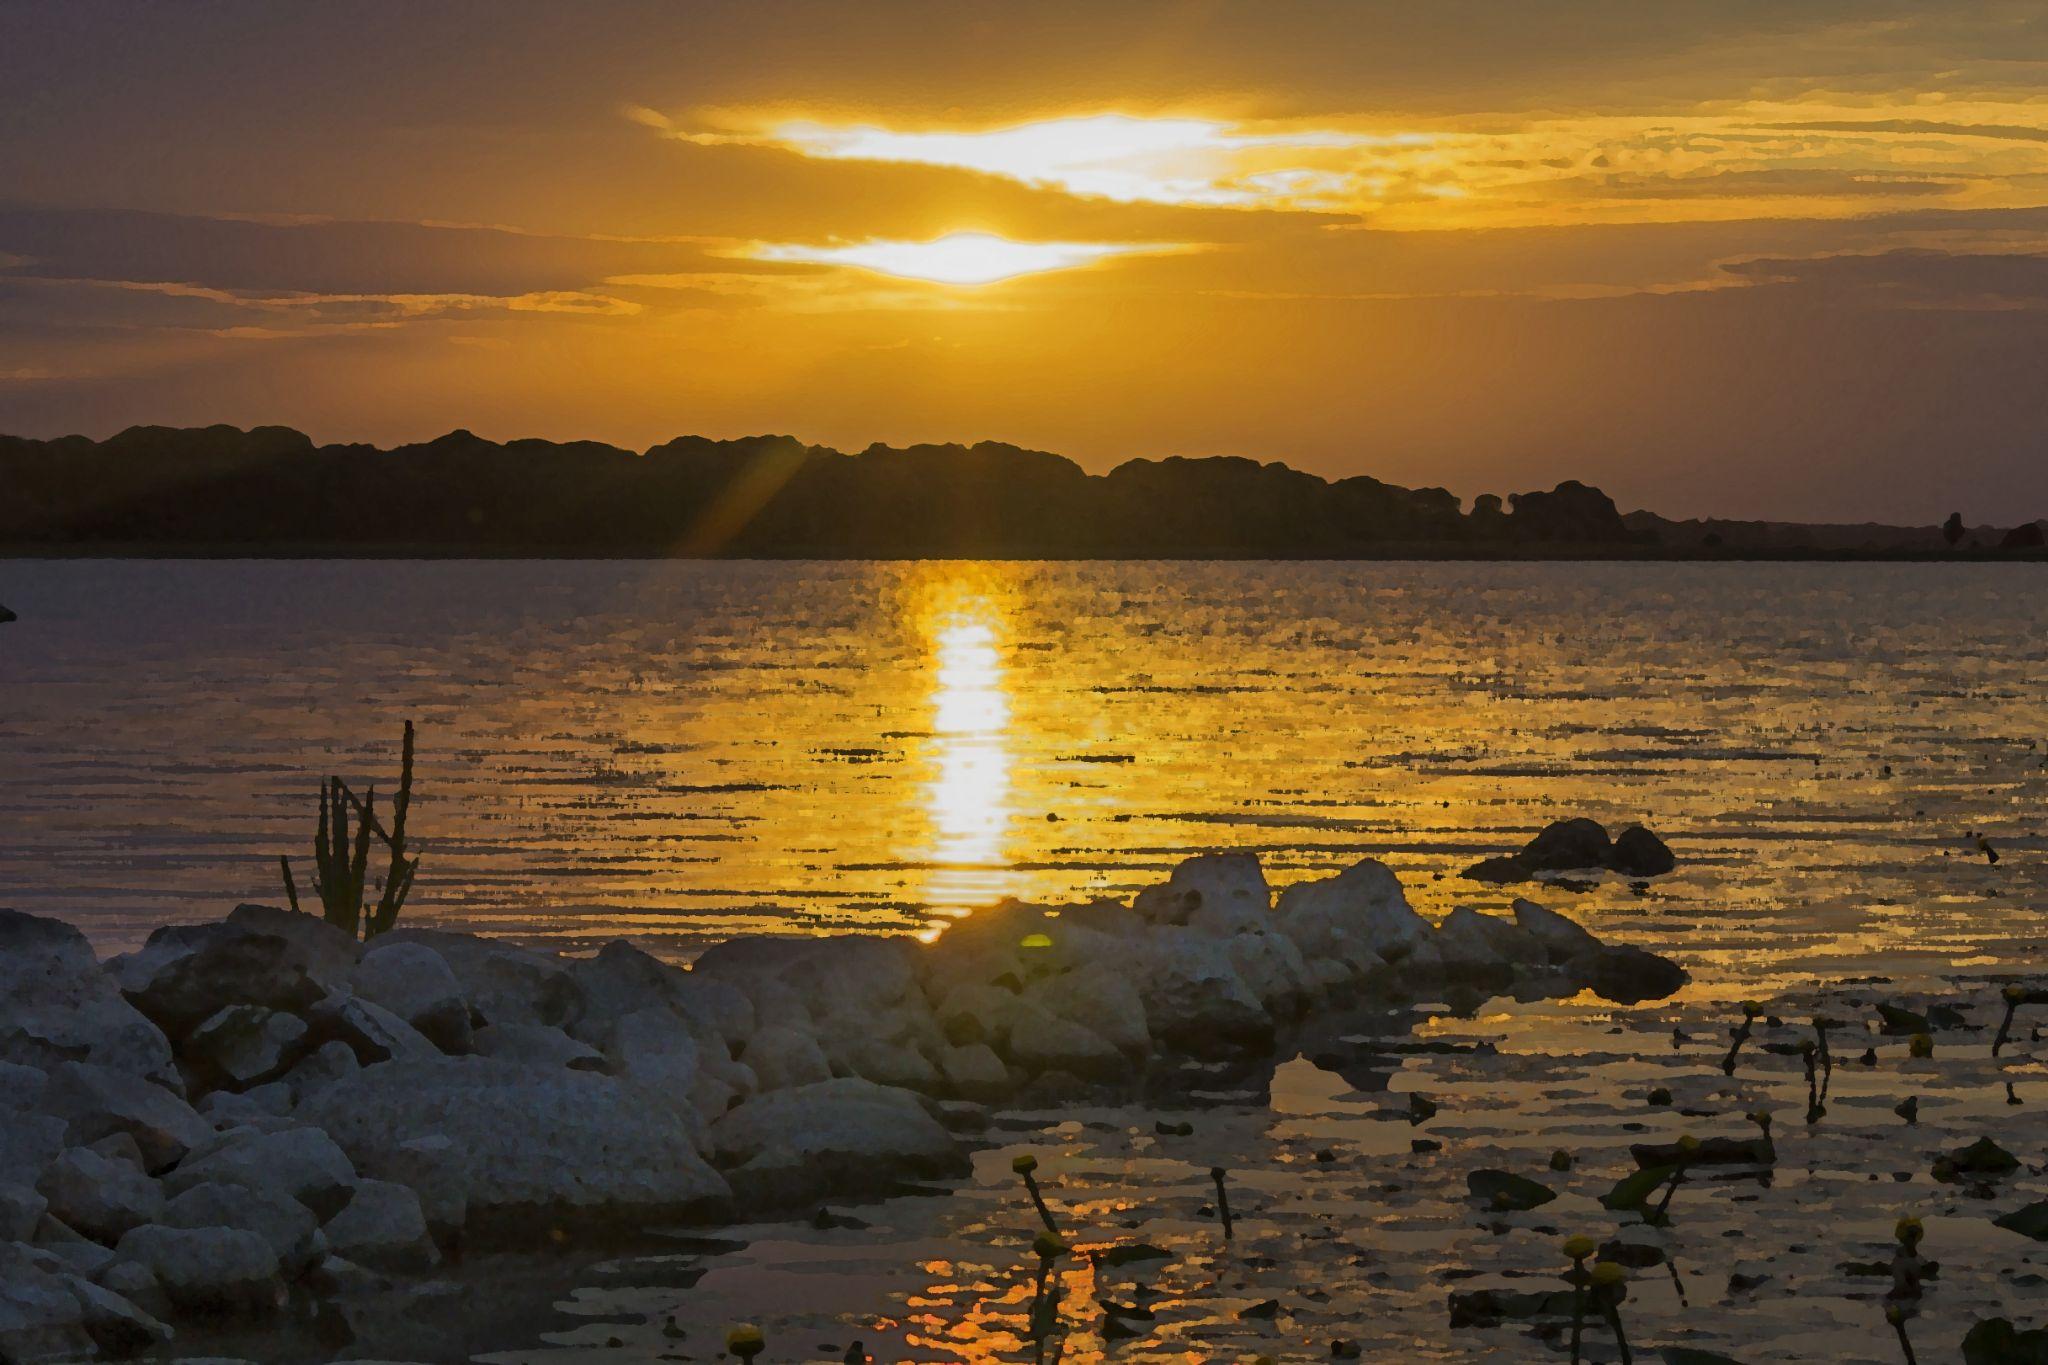 Sunset by Siobhan Bickerdike